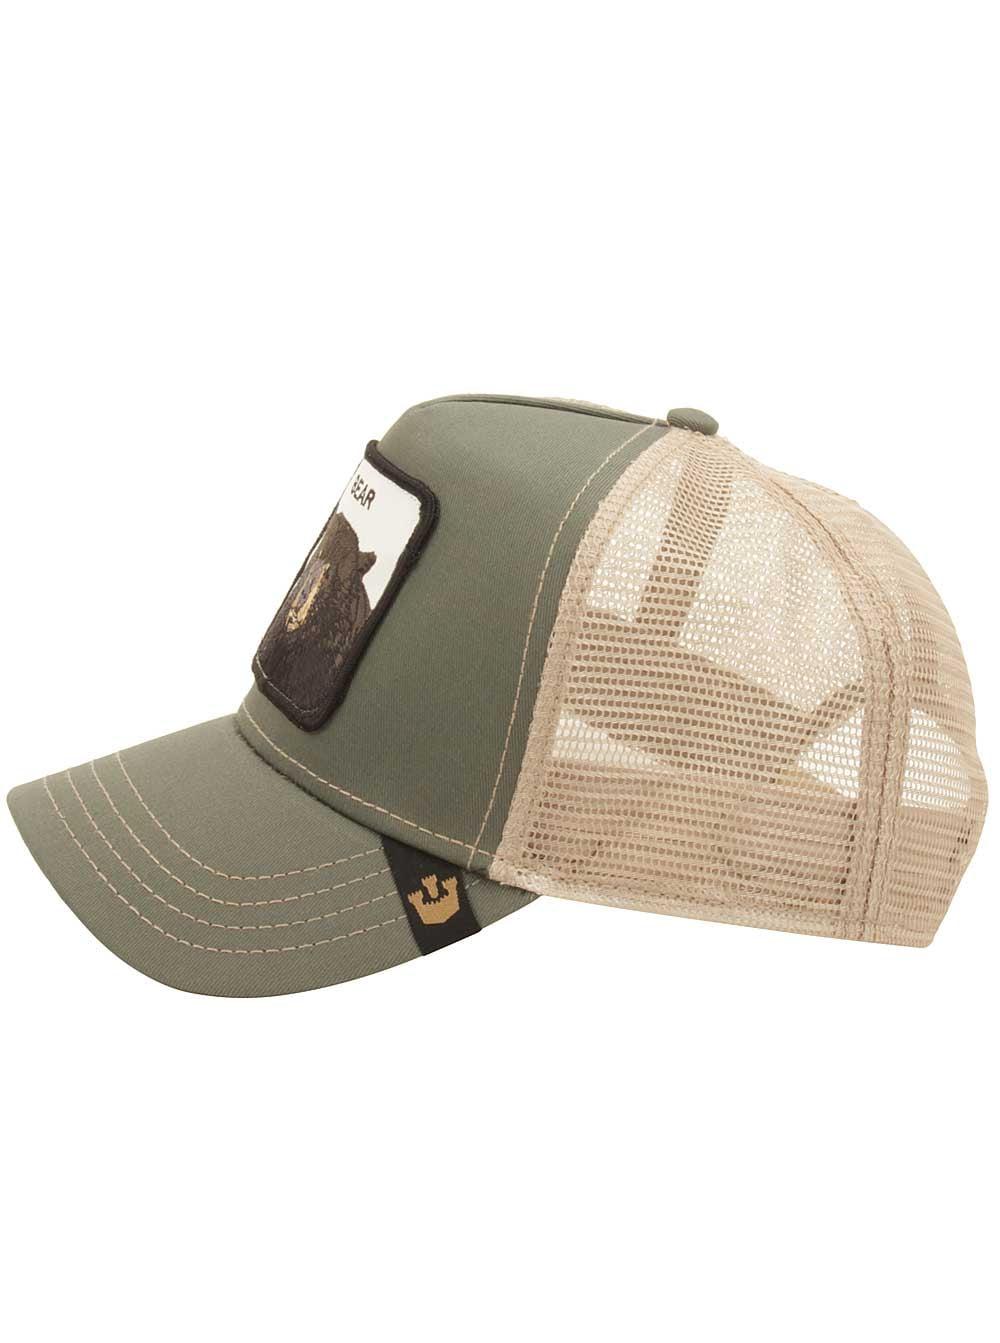 8bfd5ab5f Goorin Bros. Drew Bear Hat